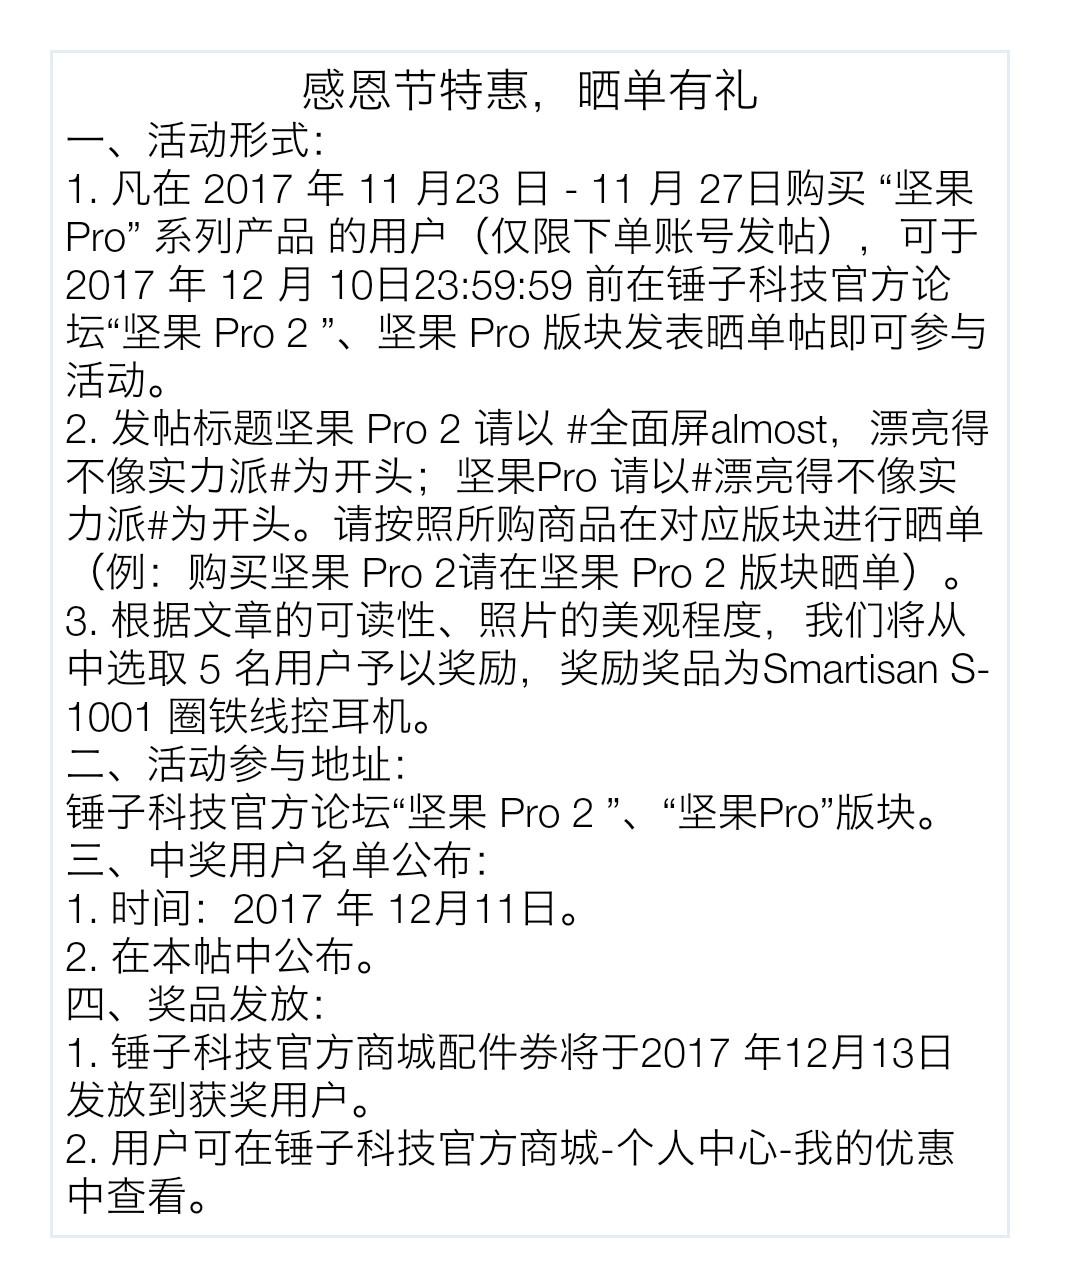 Screenshot_2017-11-23-08-50-06-967_??????.png